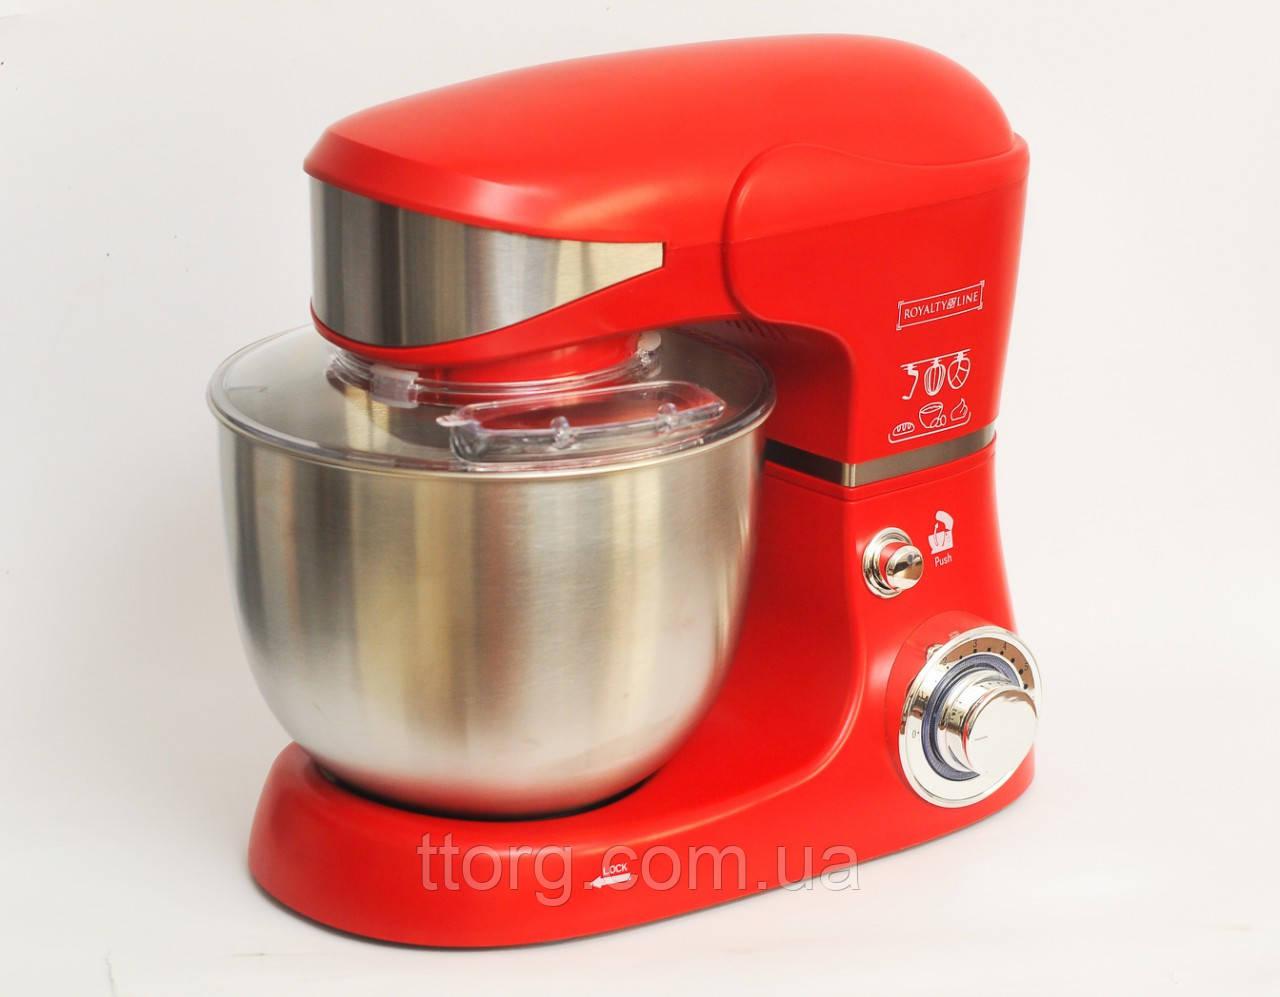 Кухонный комбайн тестомес Royalty Line RL-PKM1600 Красный 1600 Вт